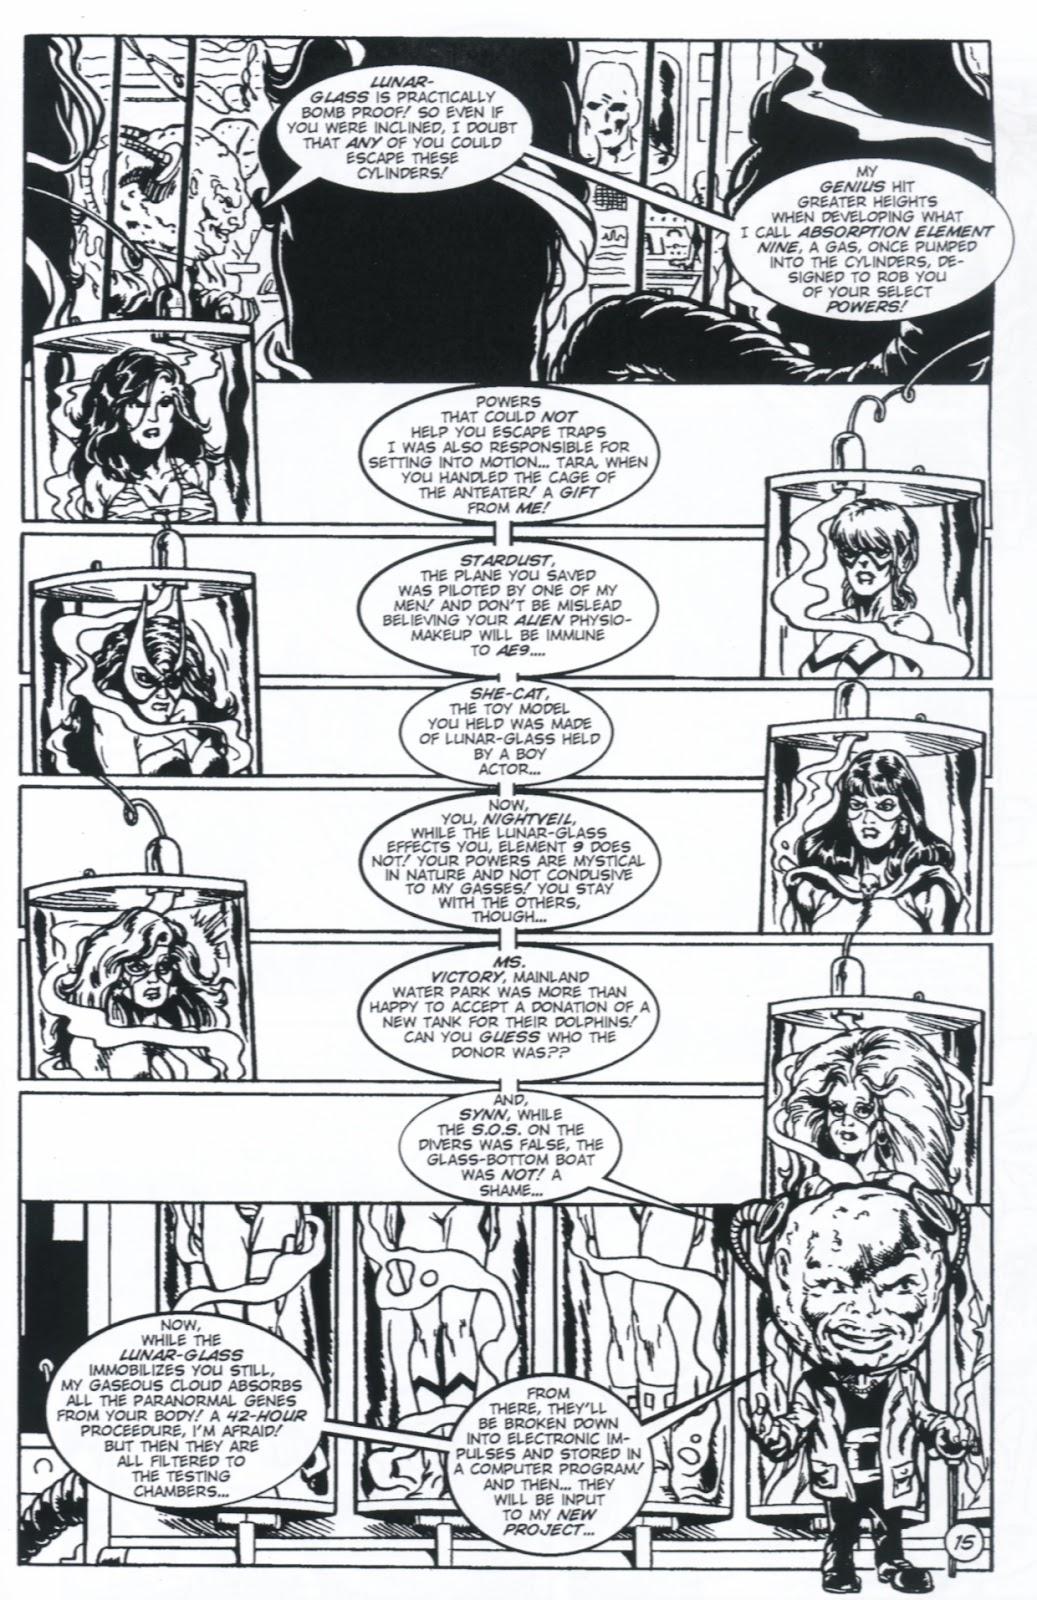 Femforce 129 Read Femforce 129 Comic Online In High Quality Read Full Comic Online For Free Read Comics Online In High Quality